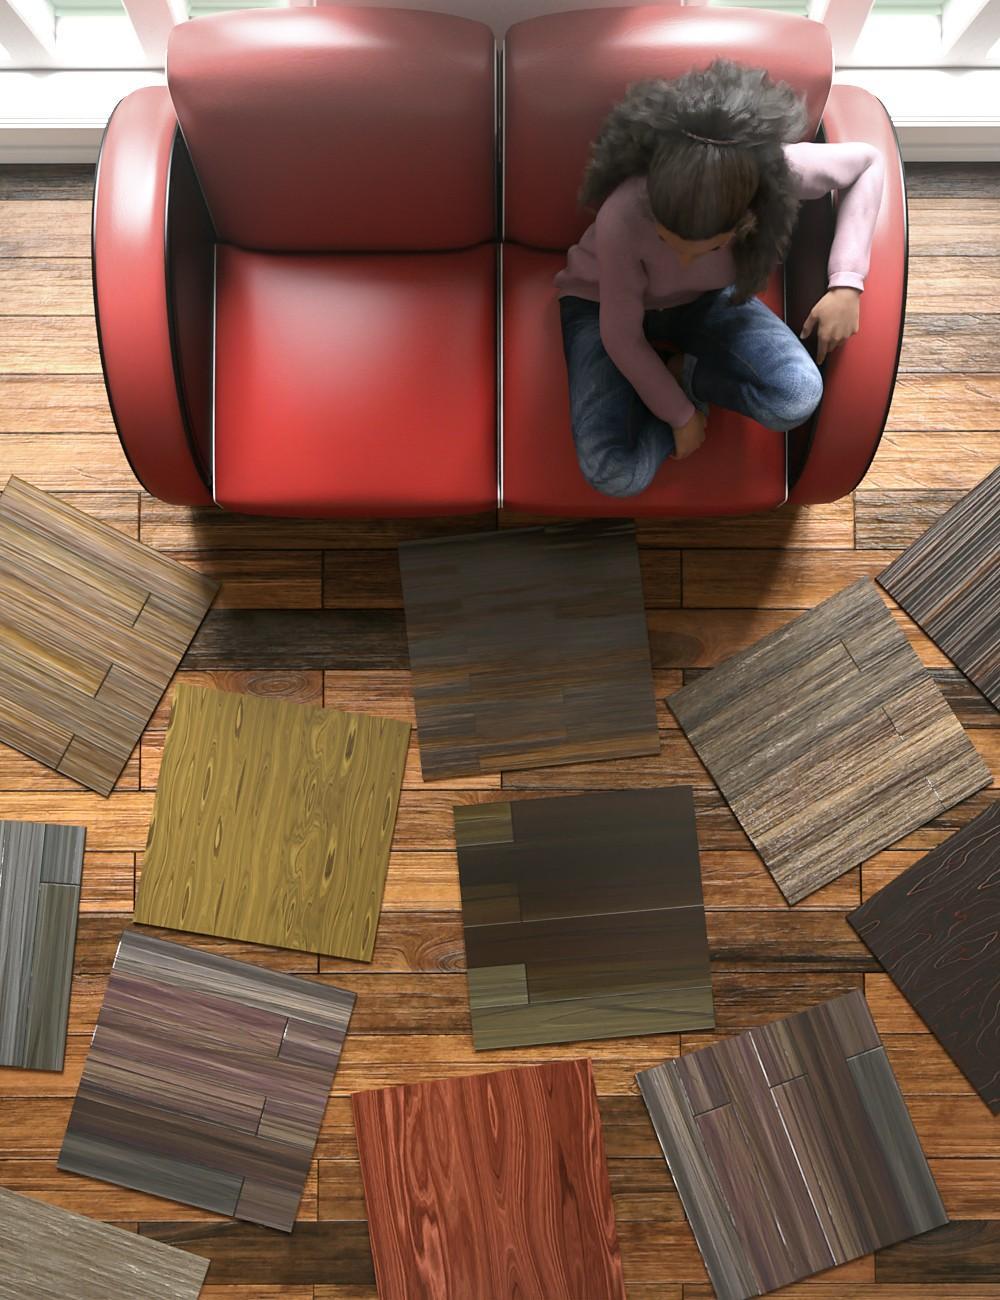 Laminated Wood Floors Iray Shaders